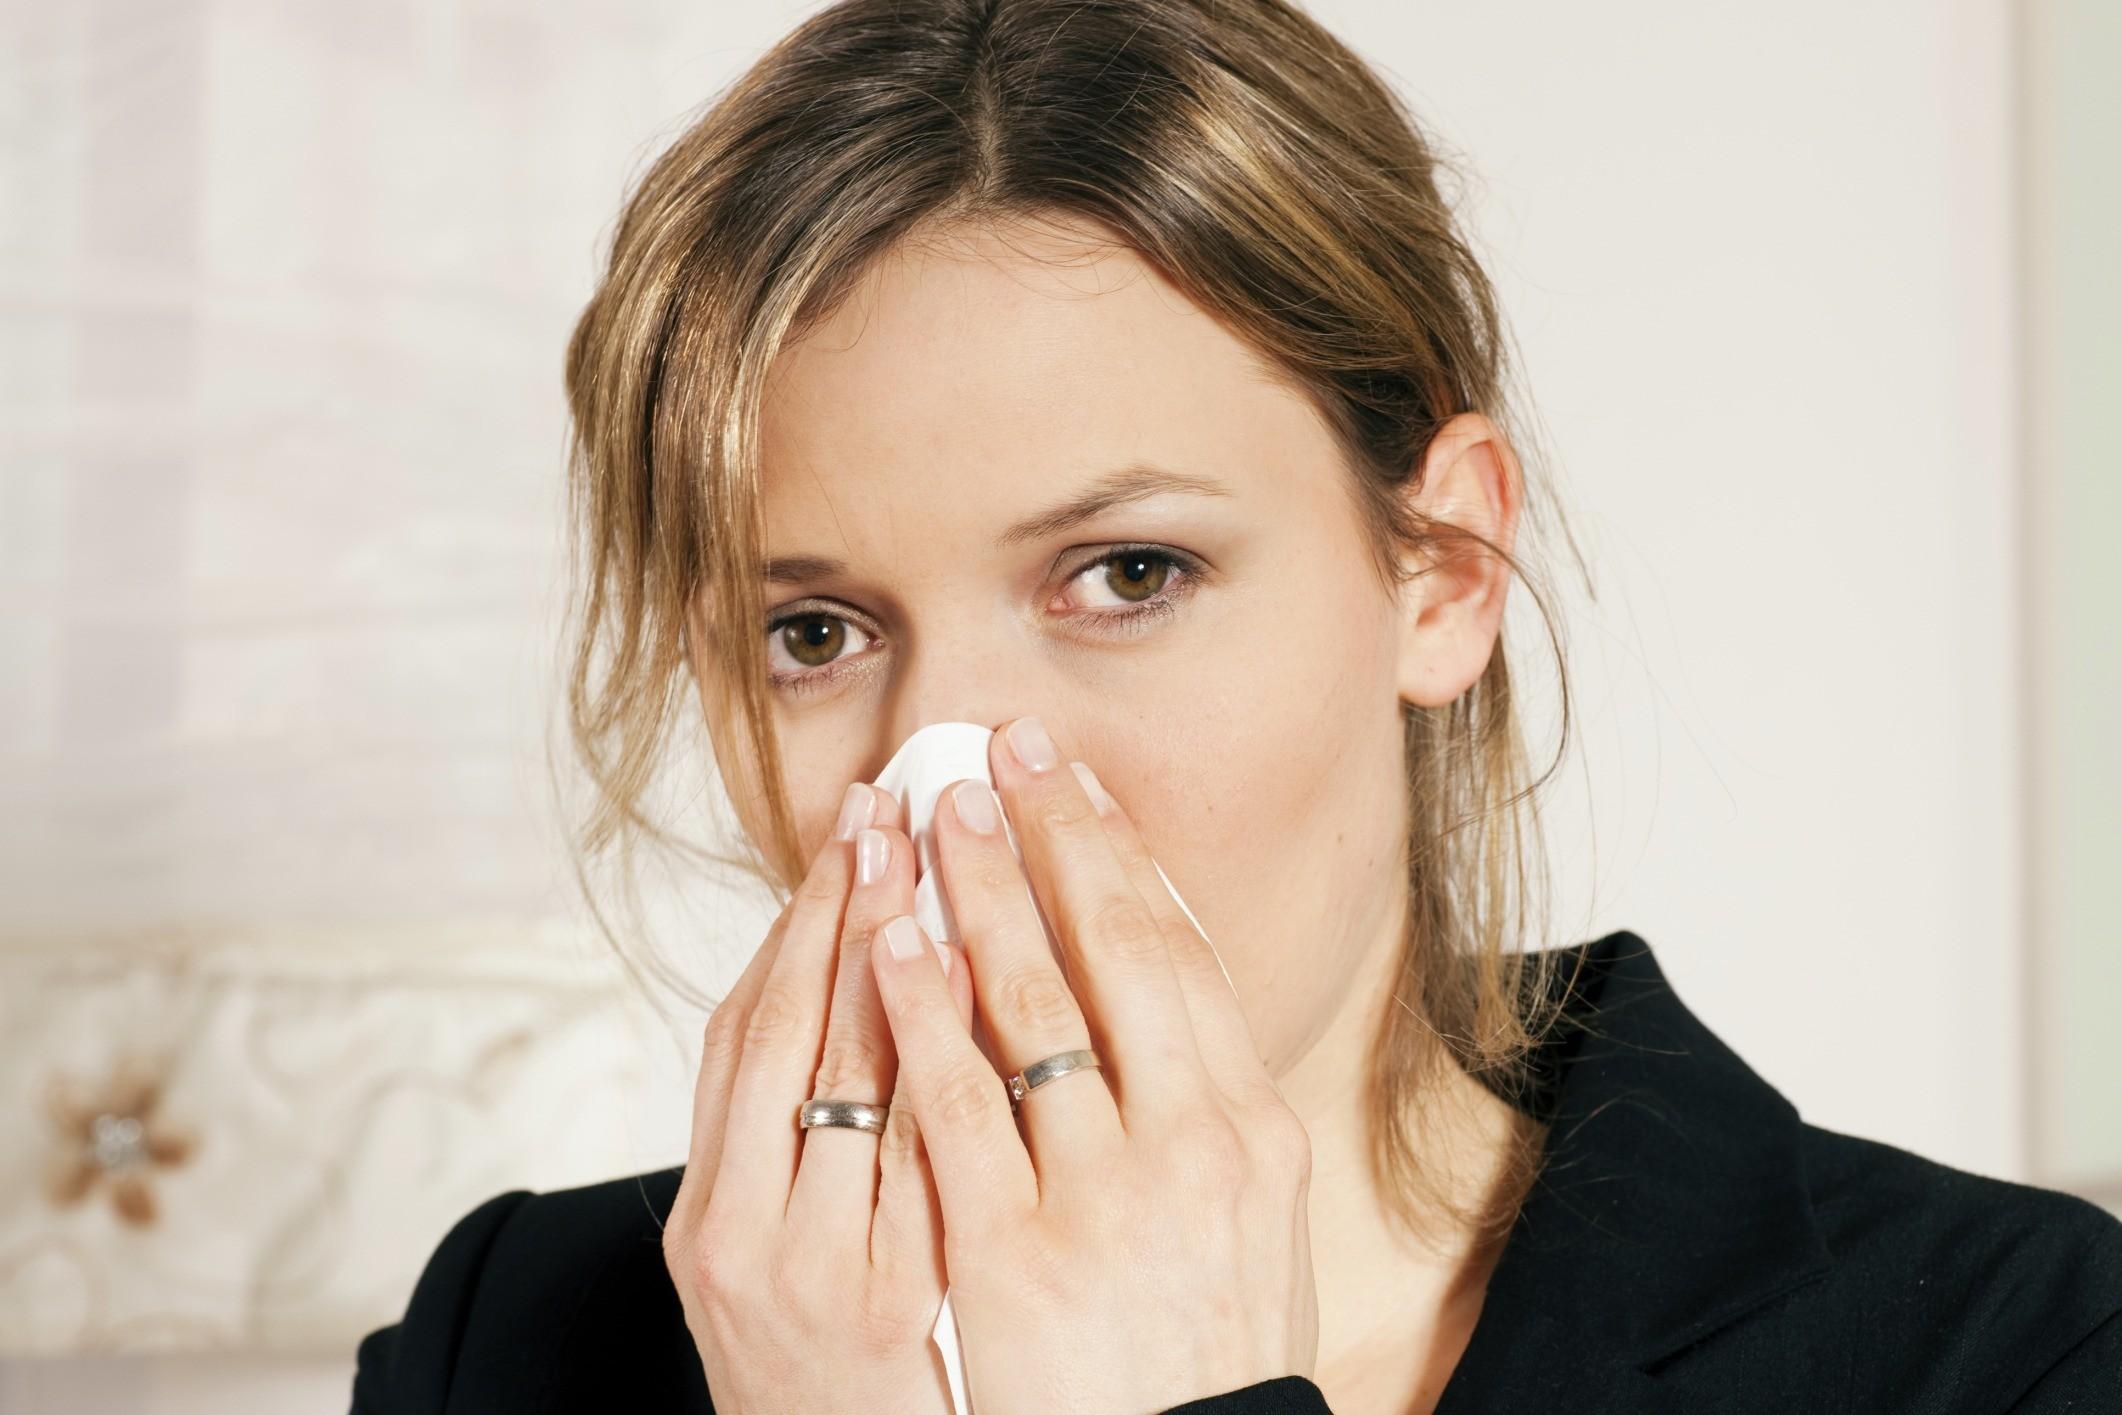 признаки аллергии на глютен у взрослых